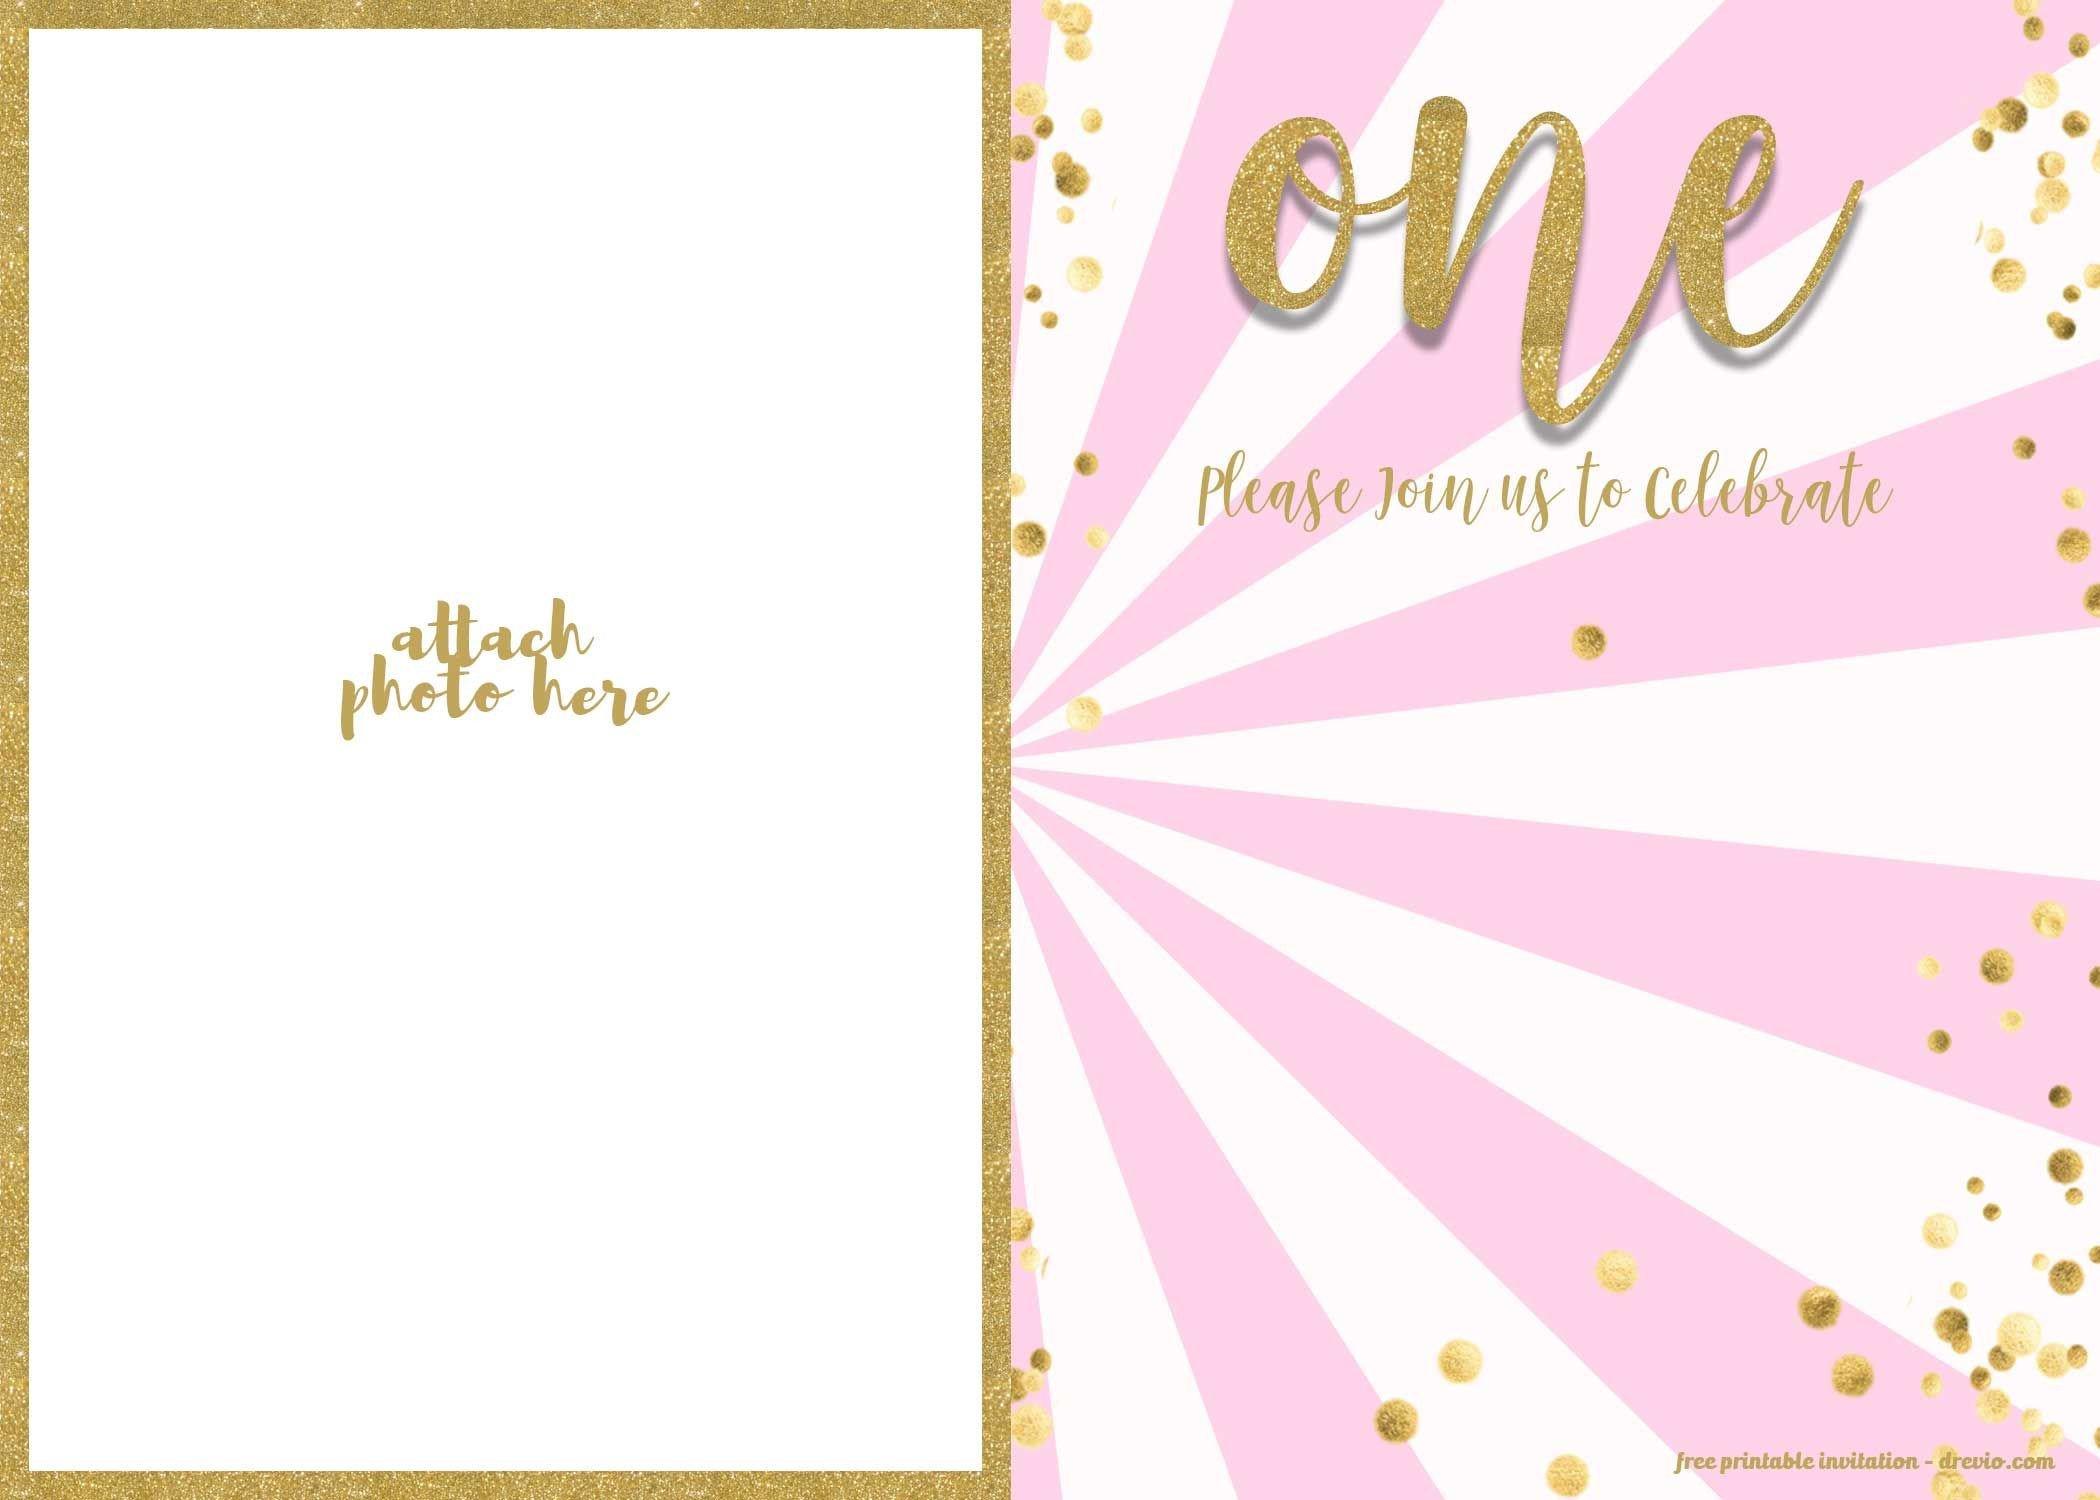 1st Birthday Invitation Template Free 1st Birthday Invitation Pink and Gold Glitter